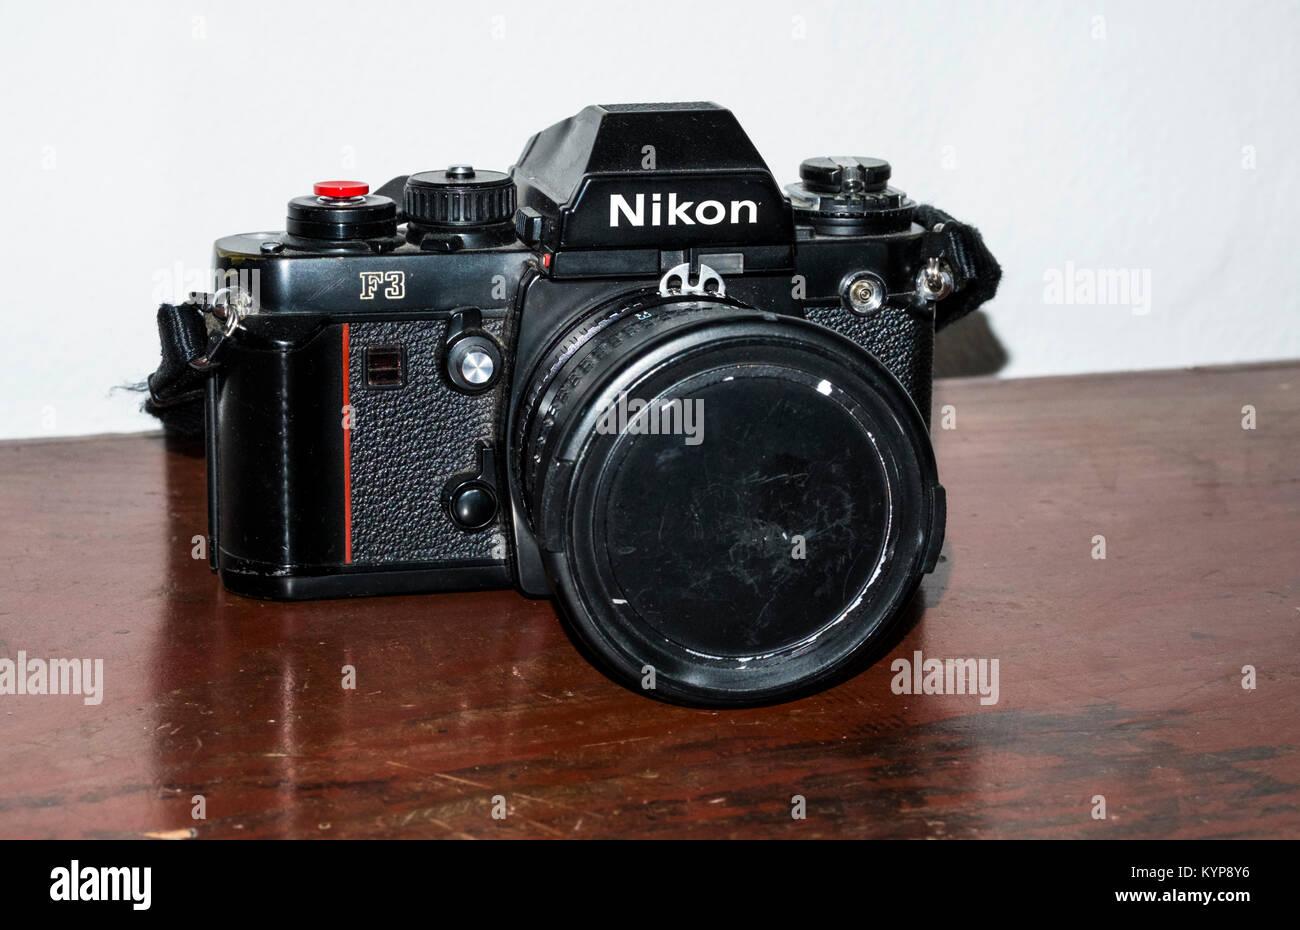 Nikon F3 Classic Film Camera - Stock Image